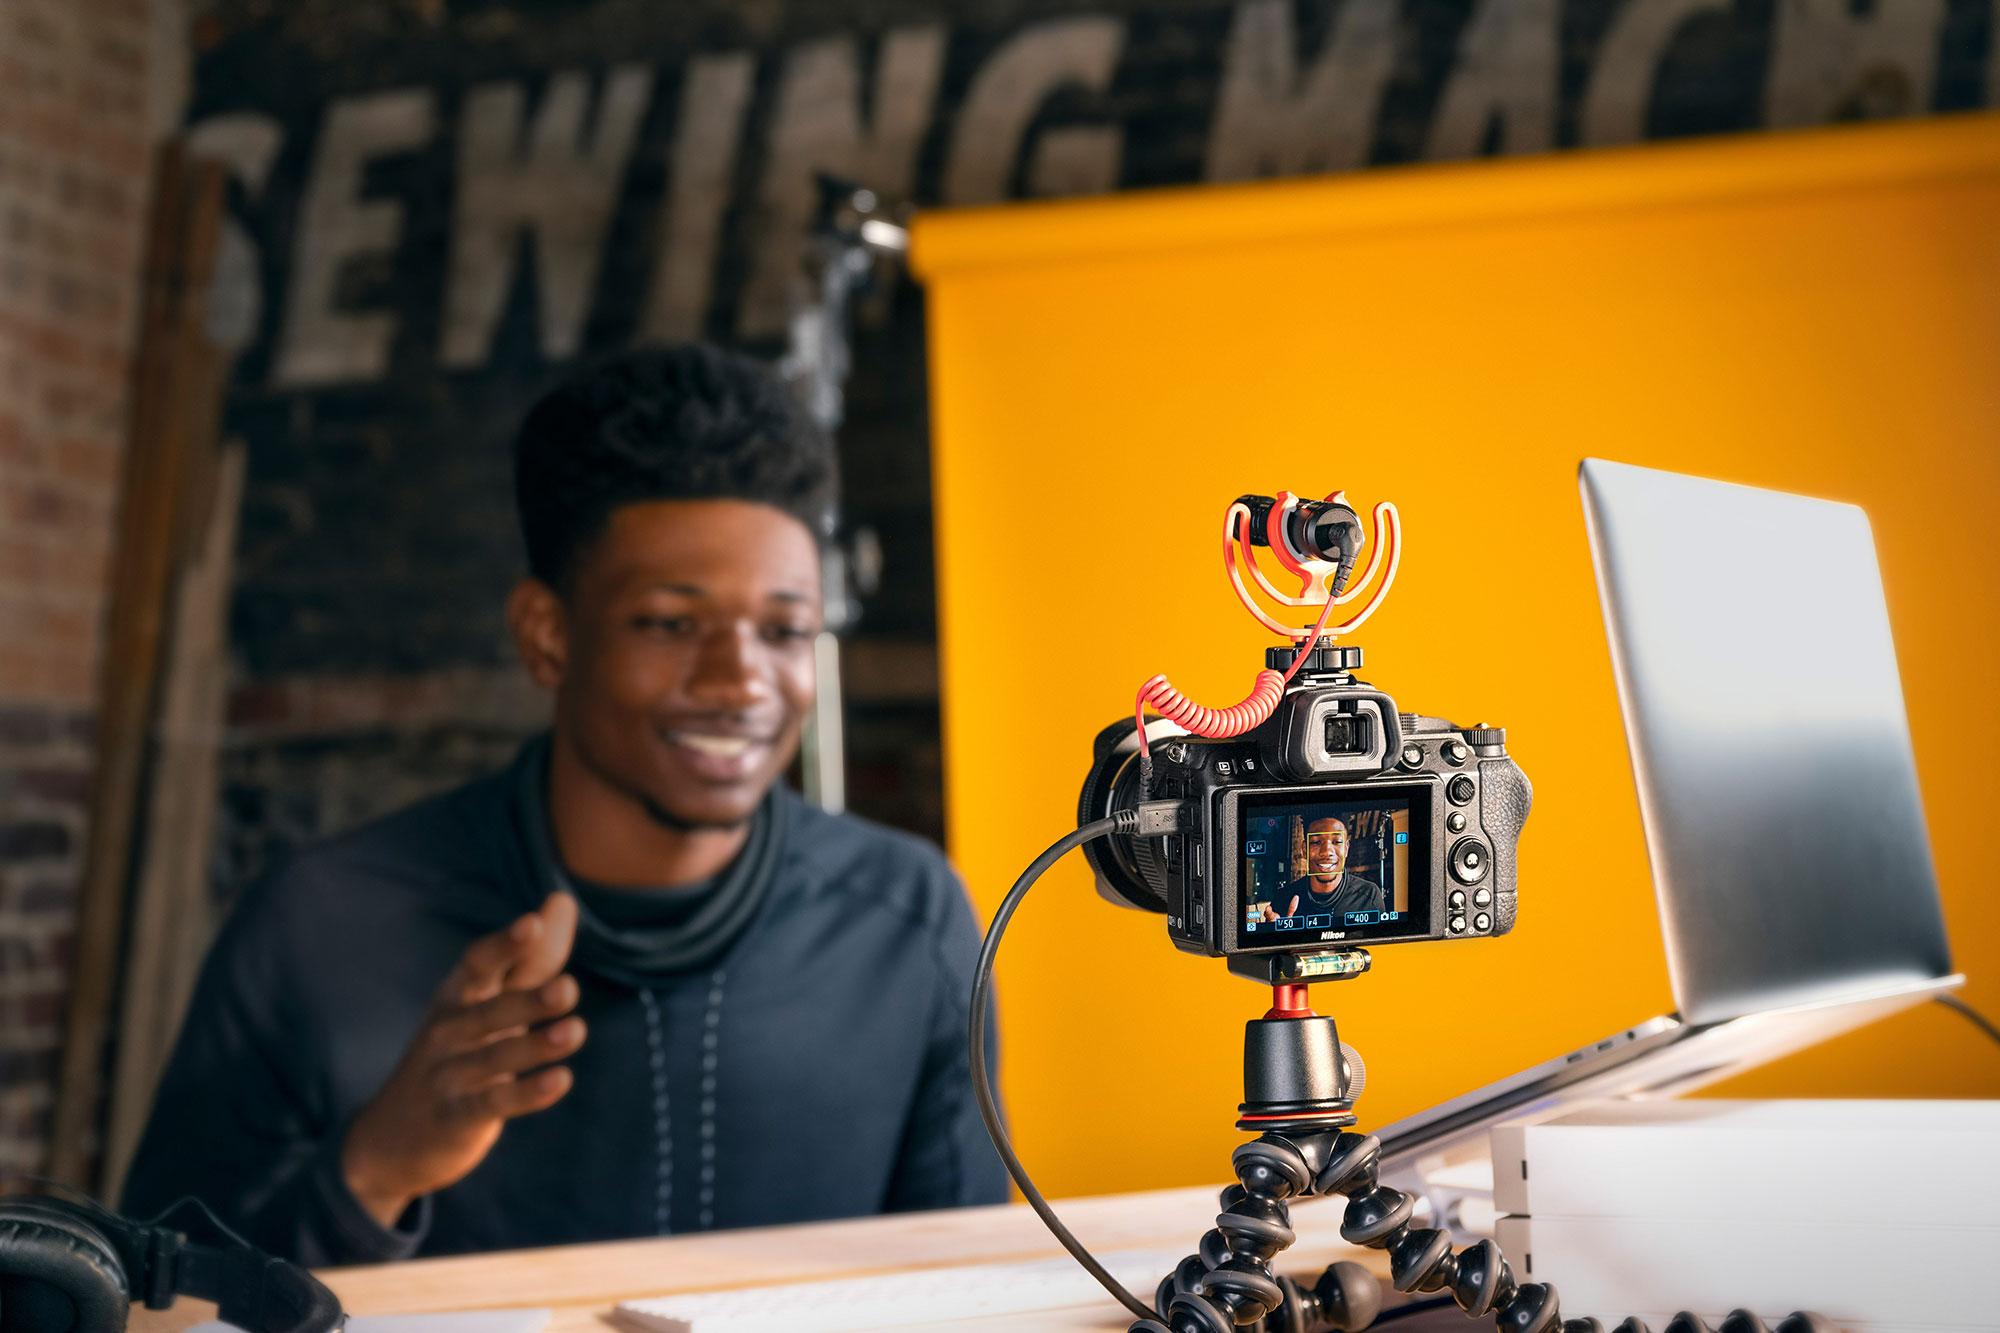 fotoaparát jako webkamera